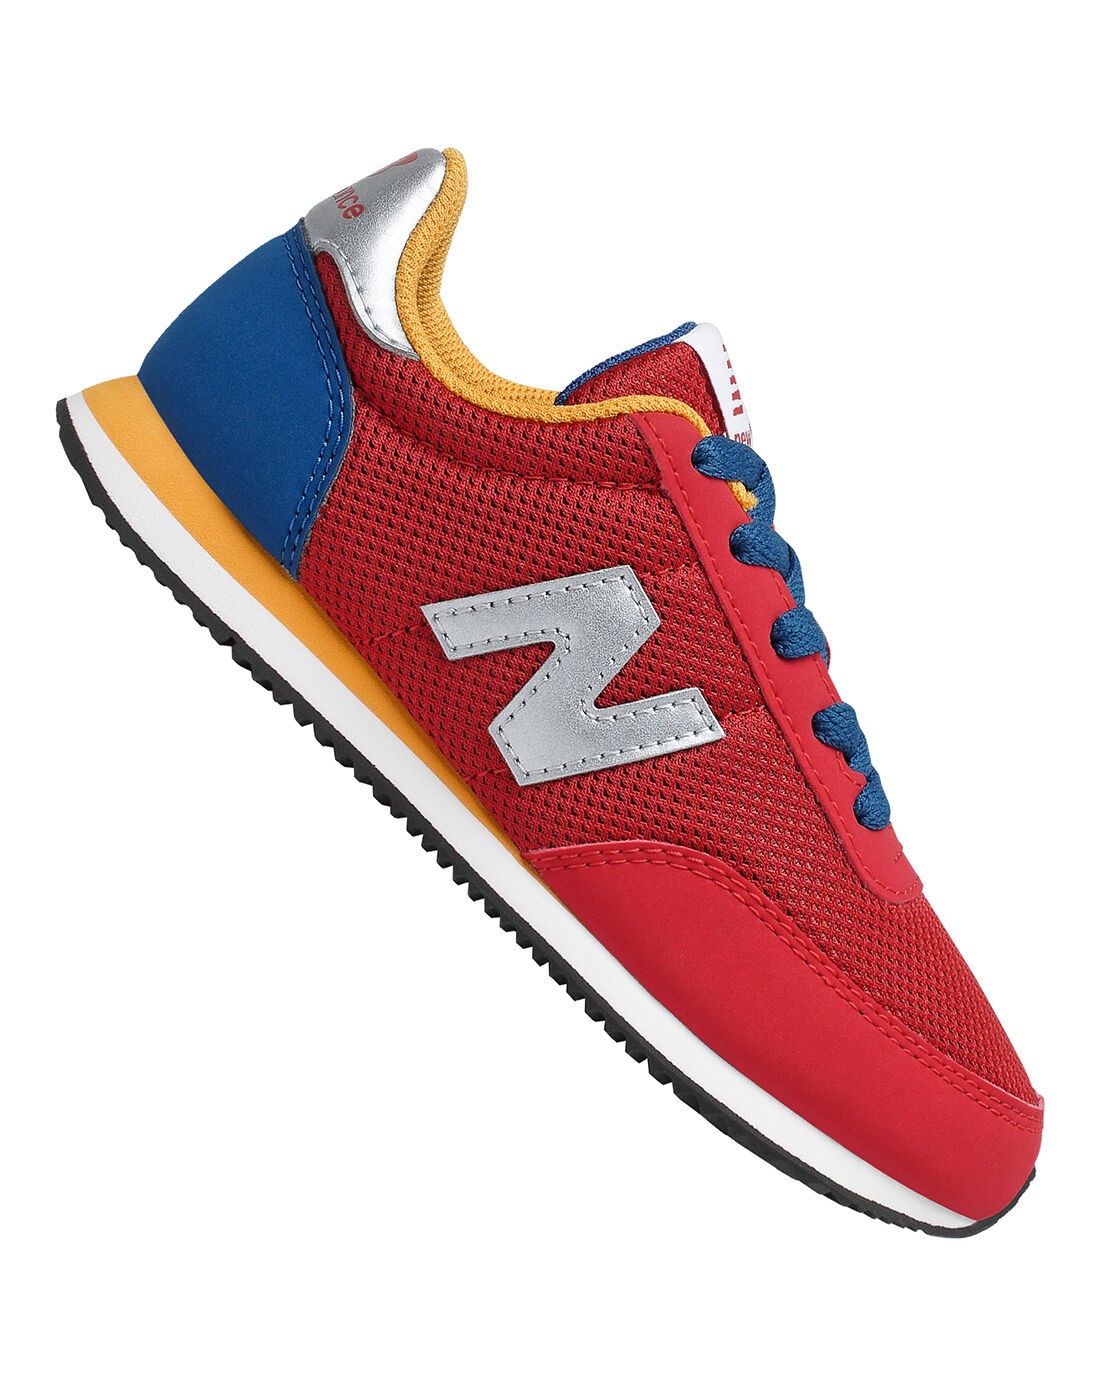 New Balance bo jackson shoes nike air orange and blue dress   Older Kids 720 Trainer